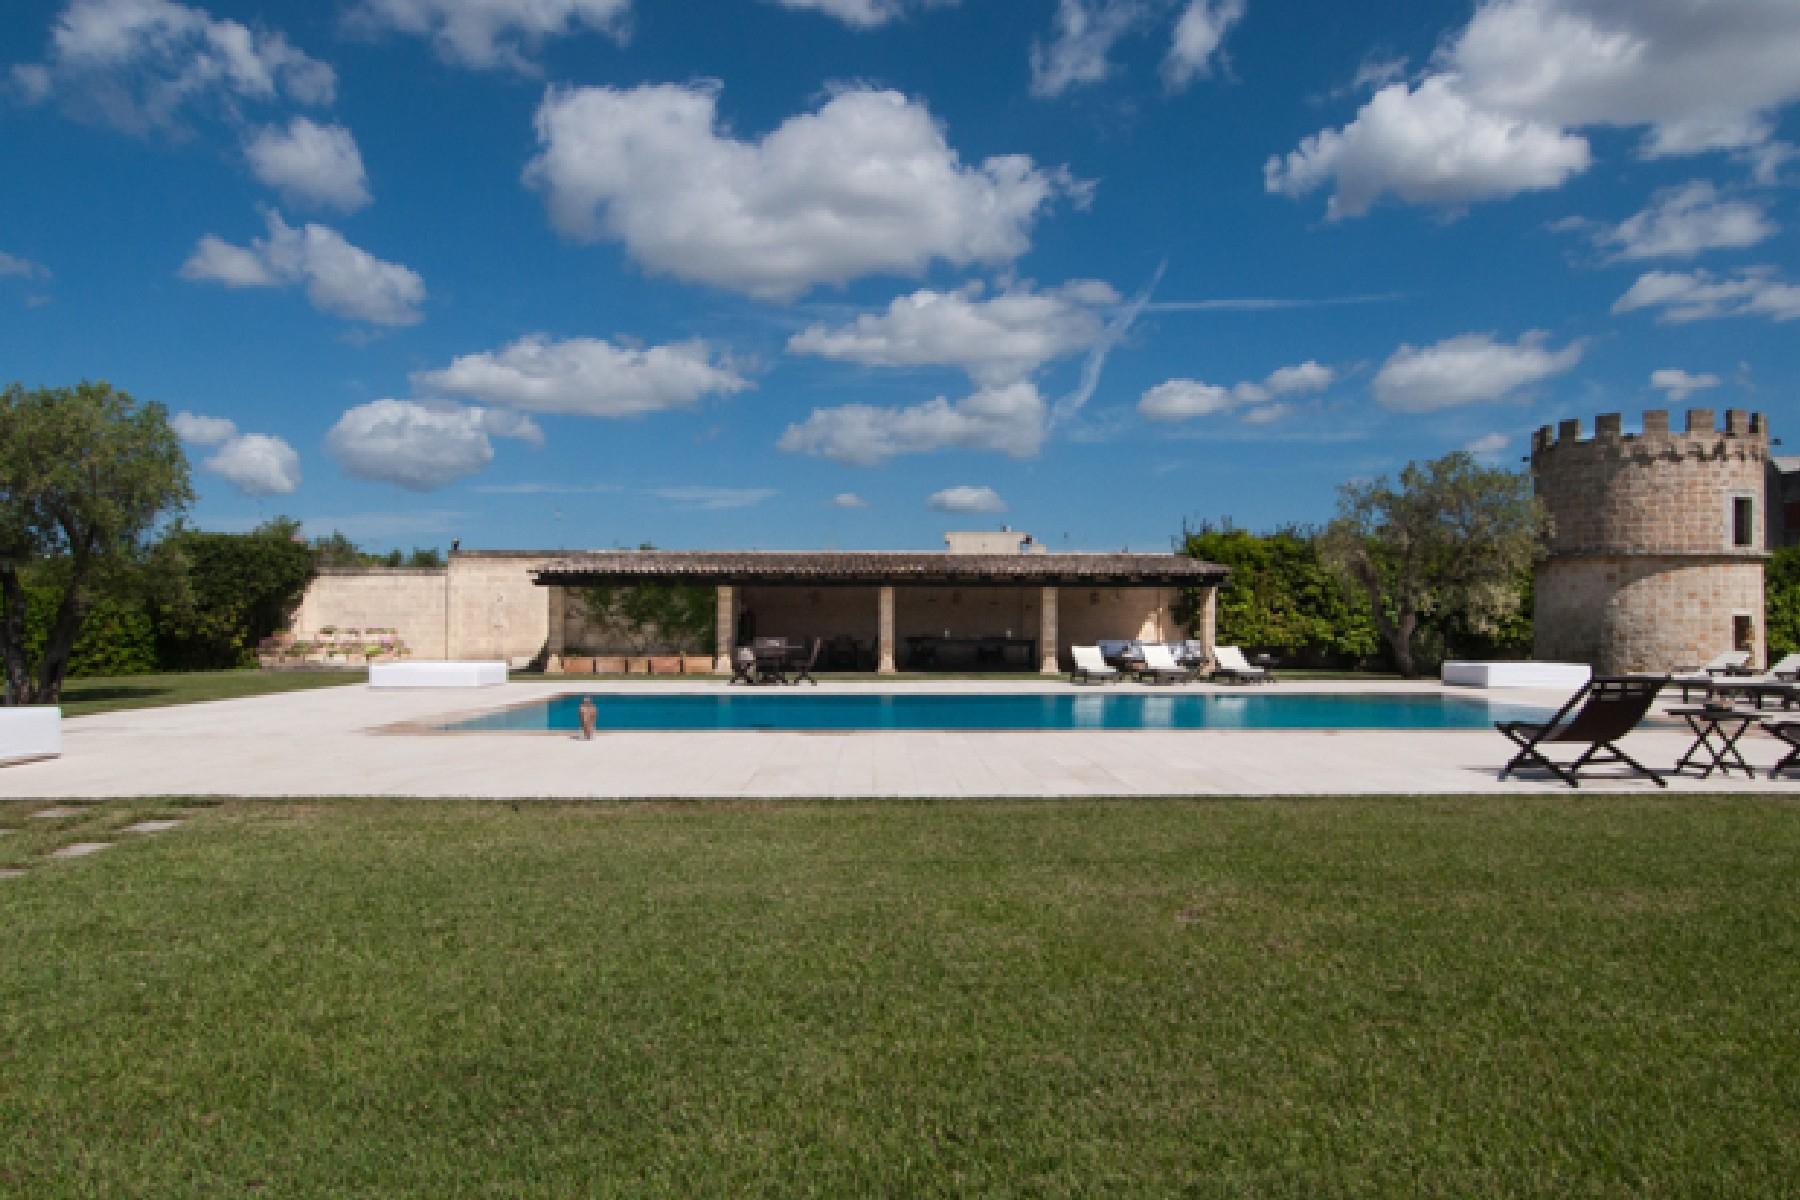 Villa in Vendita a Tricase: 5 locali, 1700 mq - Foto 6